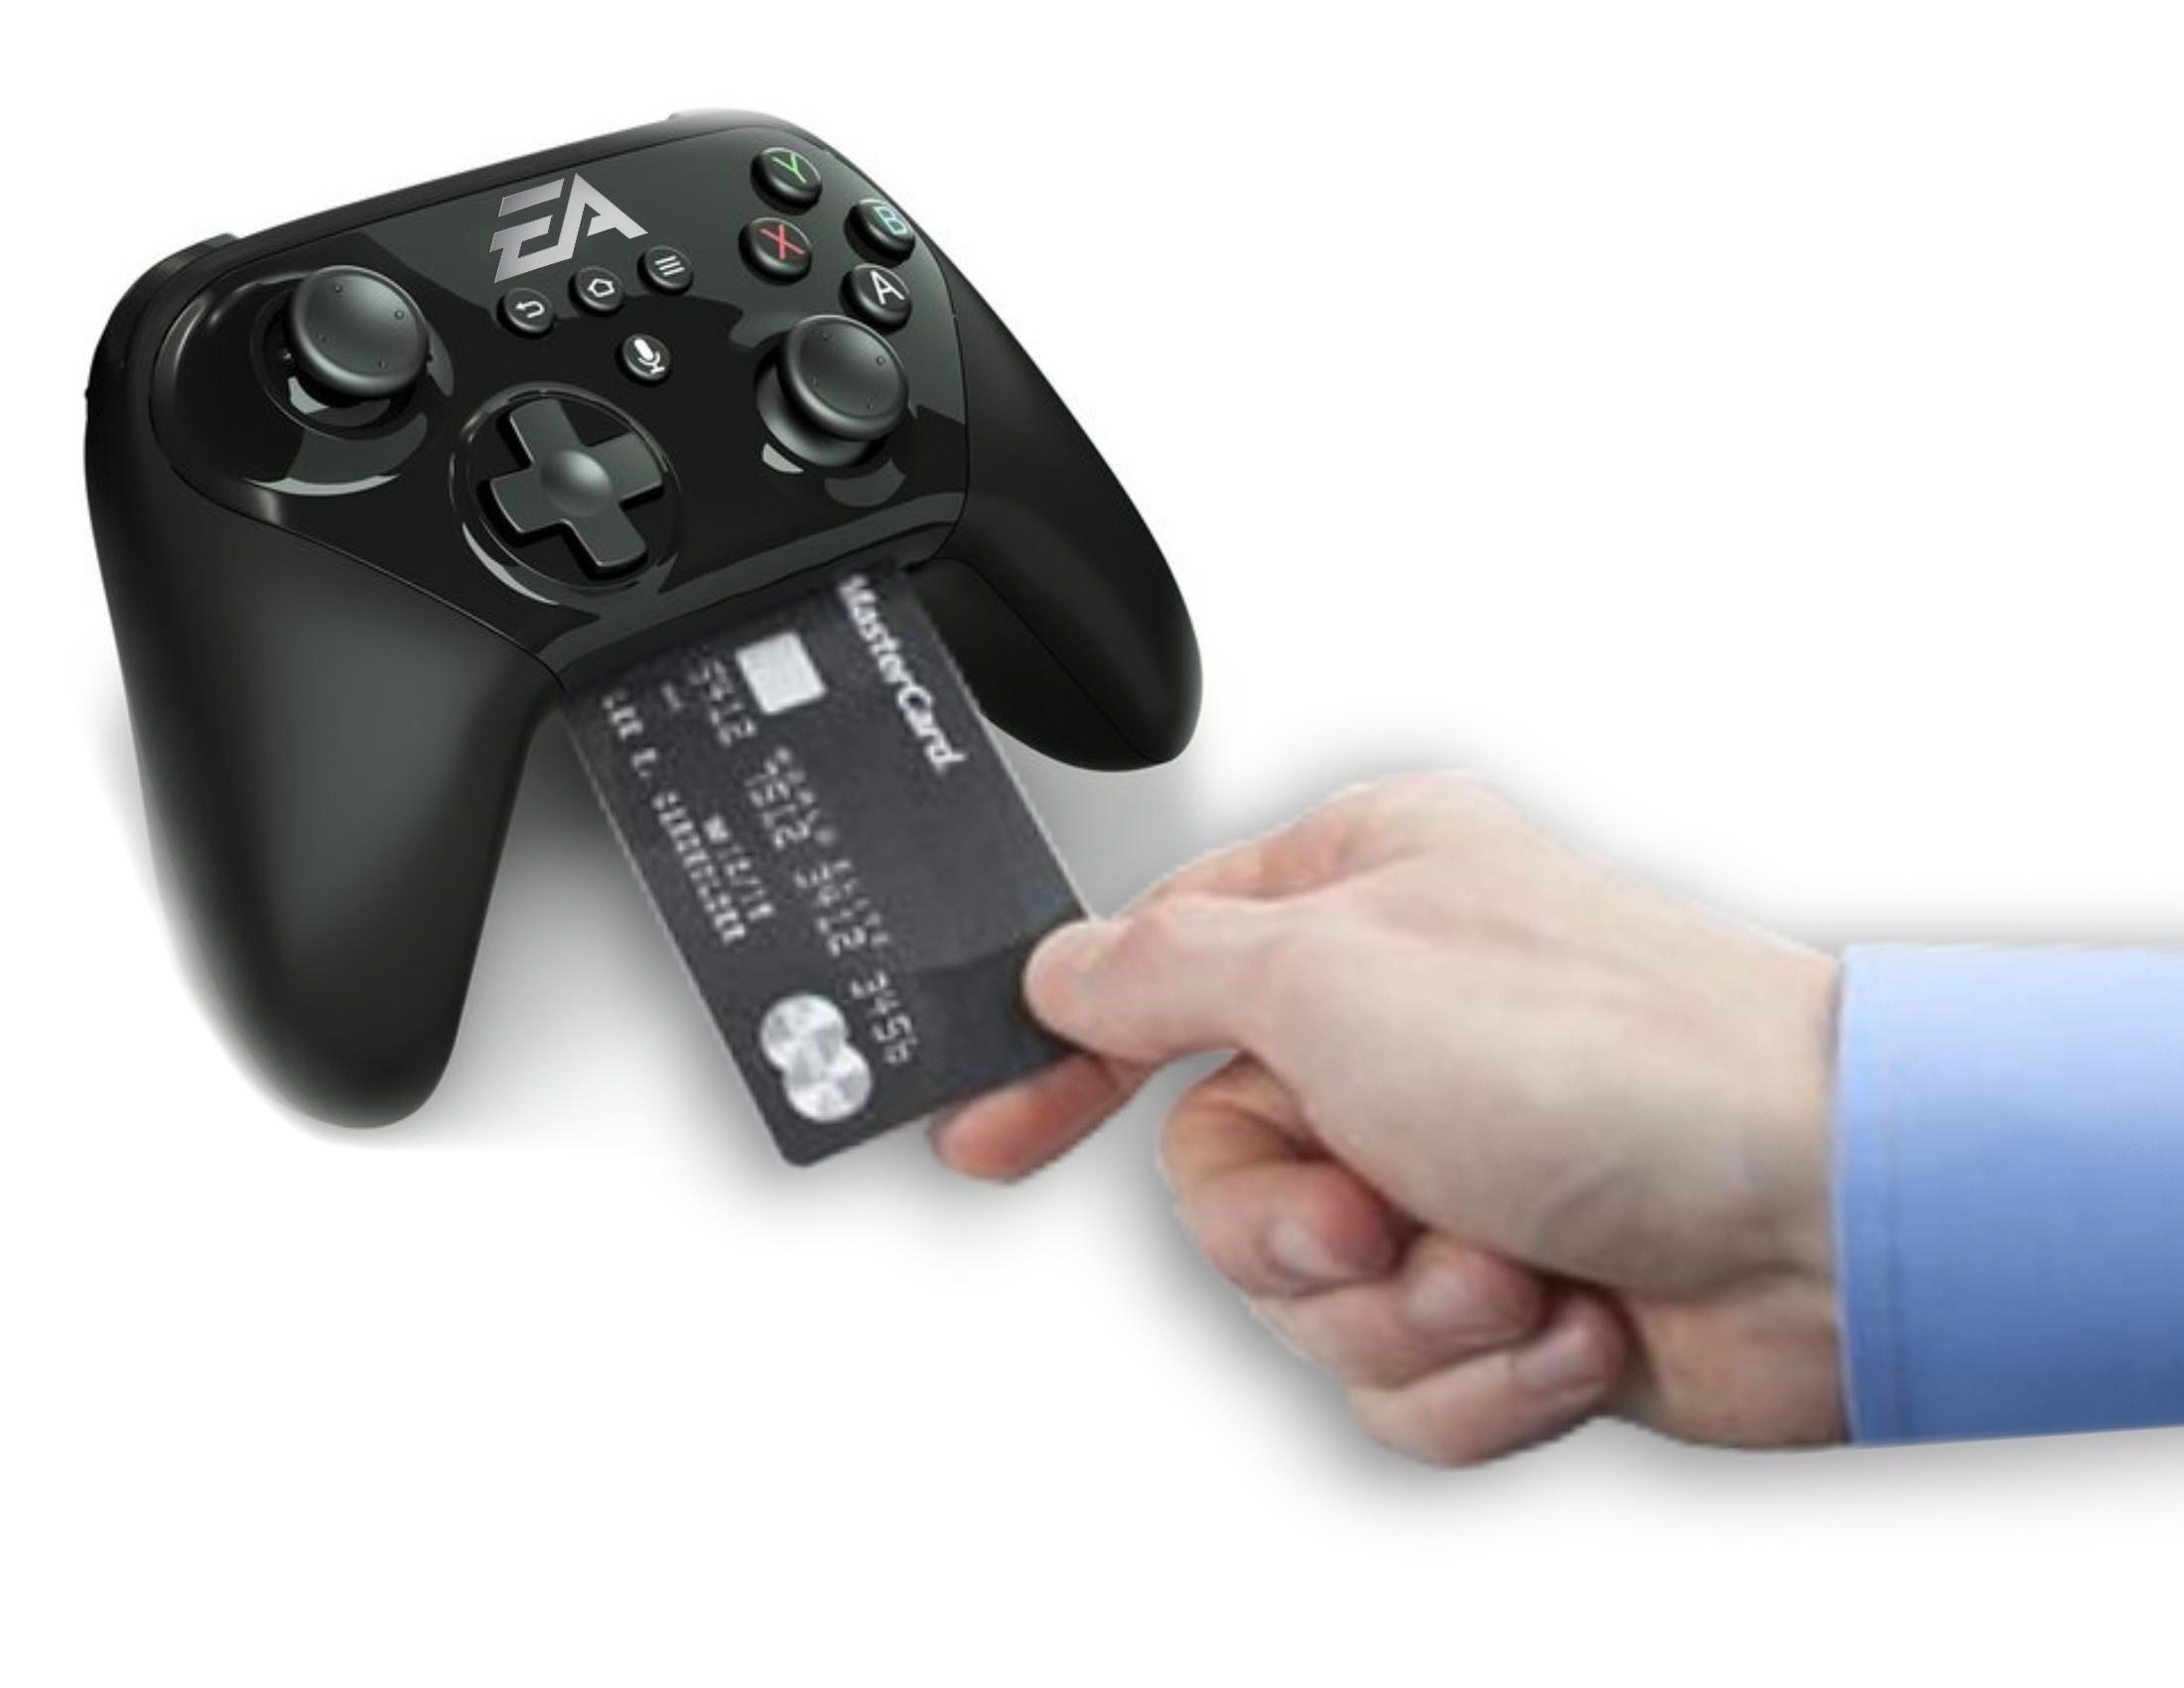 Microsoft release new Xbox One Controller via /r/funny Slot